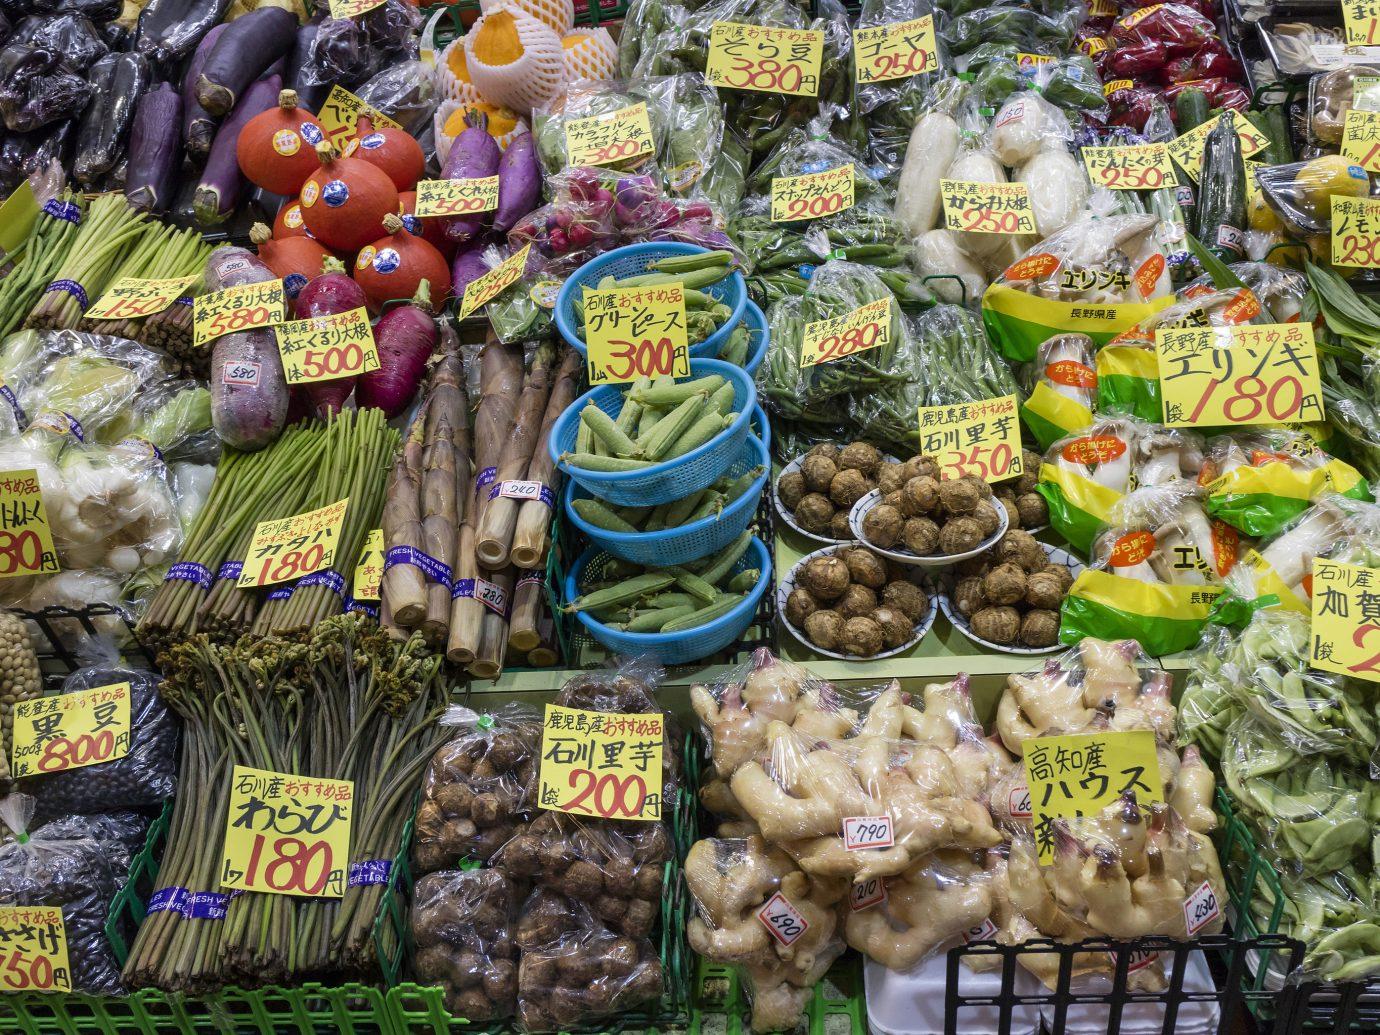 Japan Trip Ideas produce natural foods local food marketplace vegetable greengrocer whole food market food grocery store fruit bazaar vendor